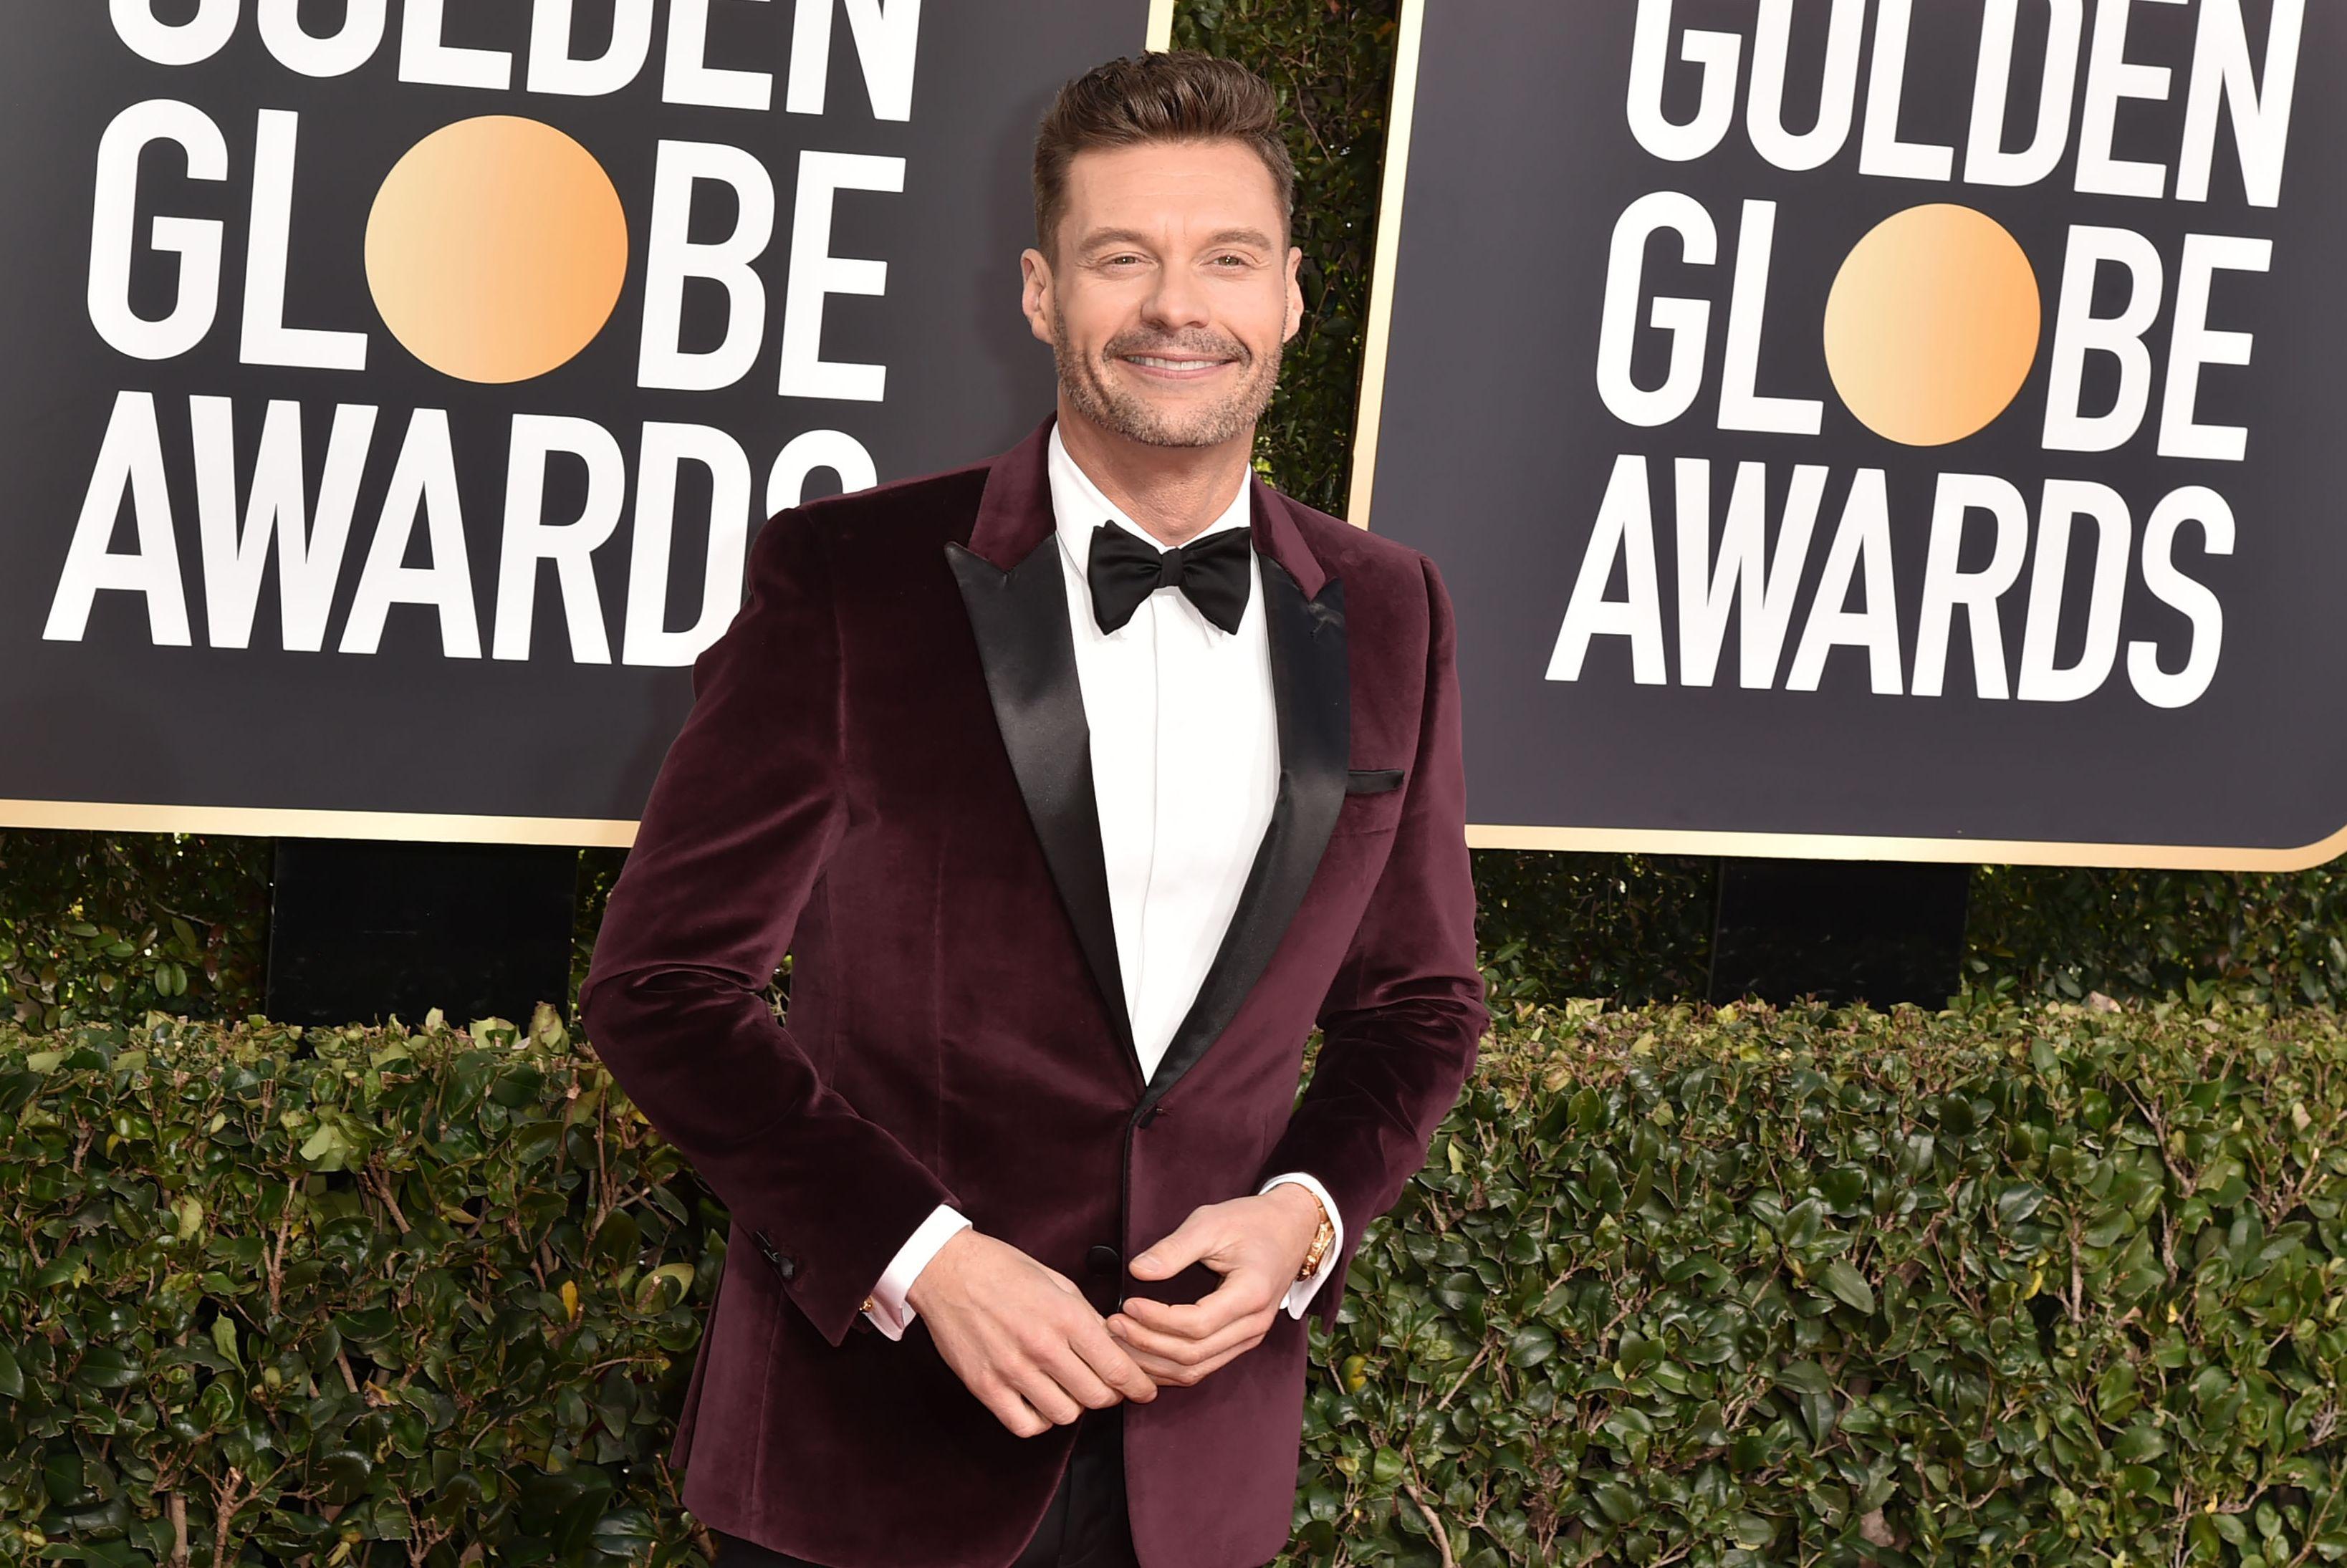 Ryan Seacrest - Golden Globe 2019 Awkward Moments